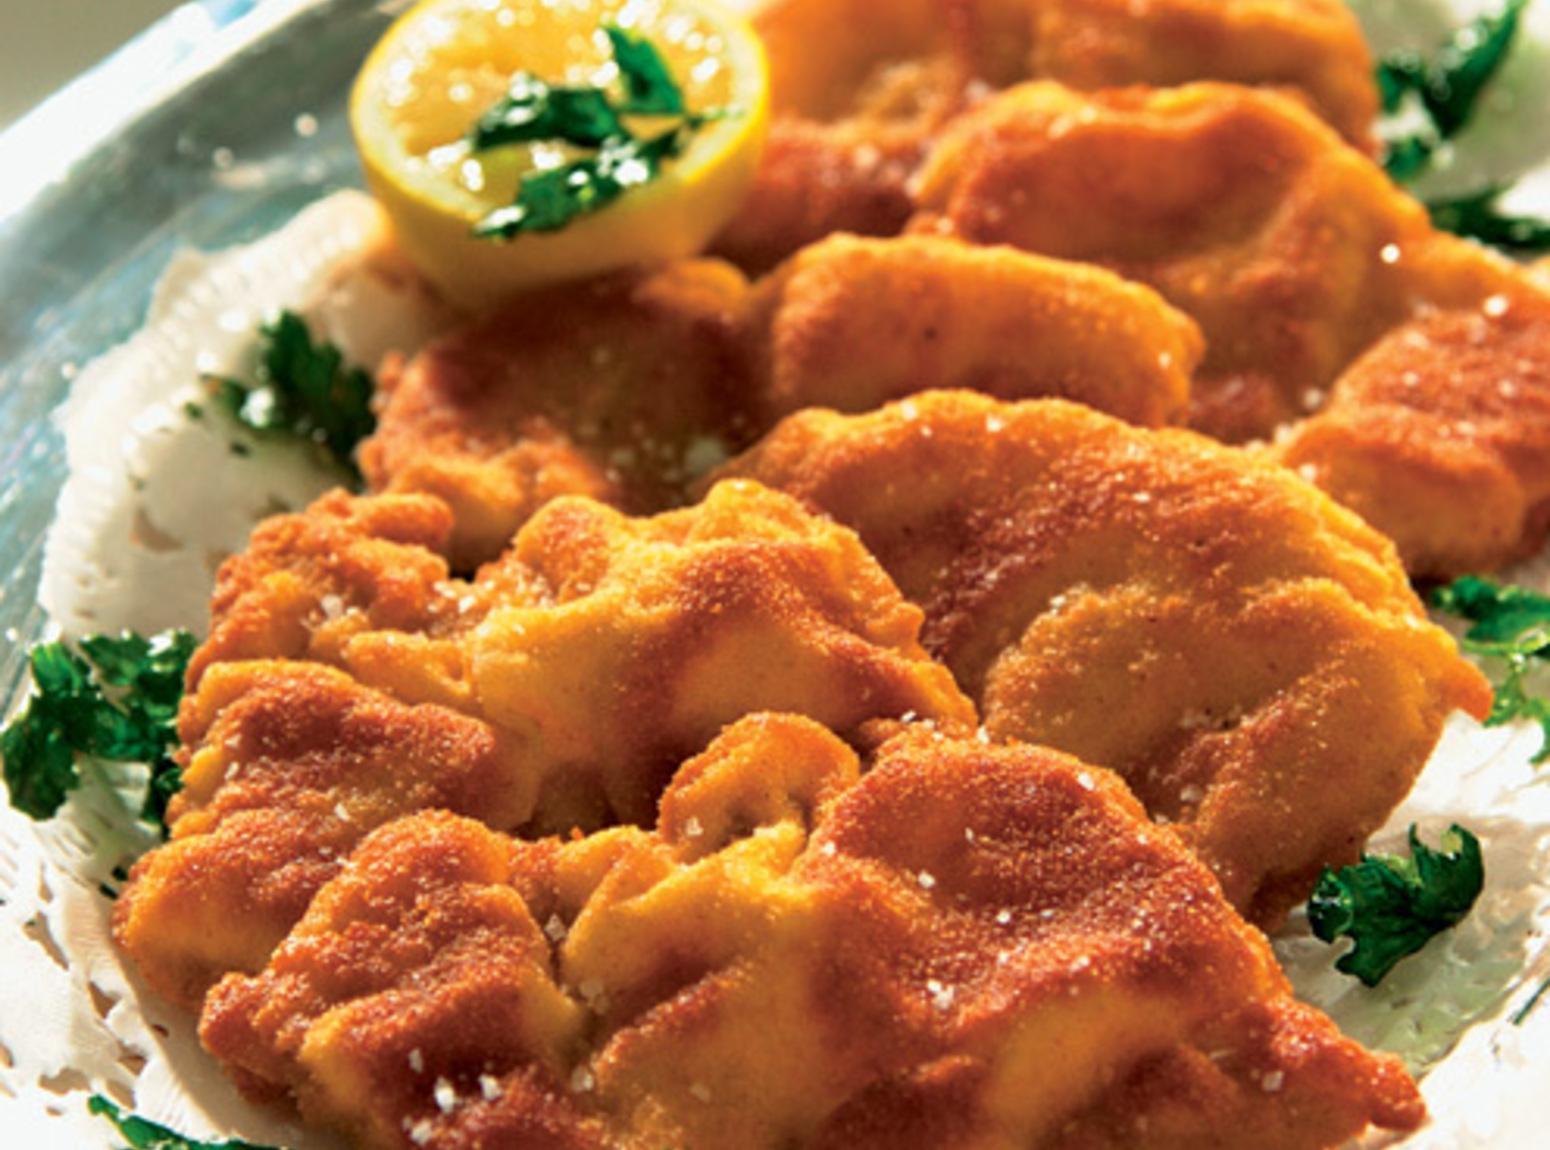 Schnitzel - Thin Breaded German Pork Chops Recipe